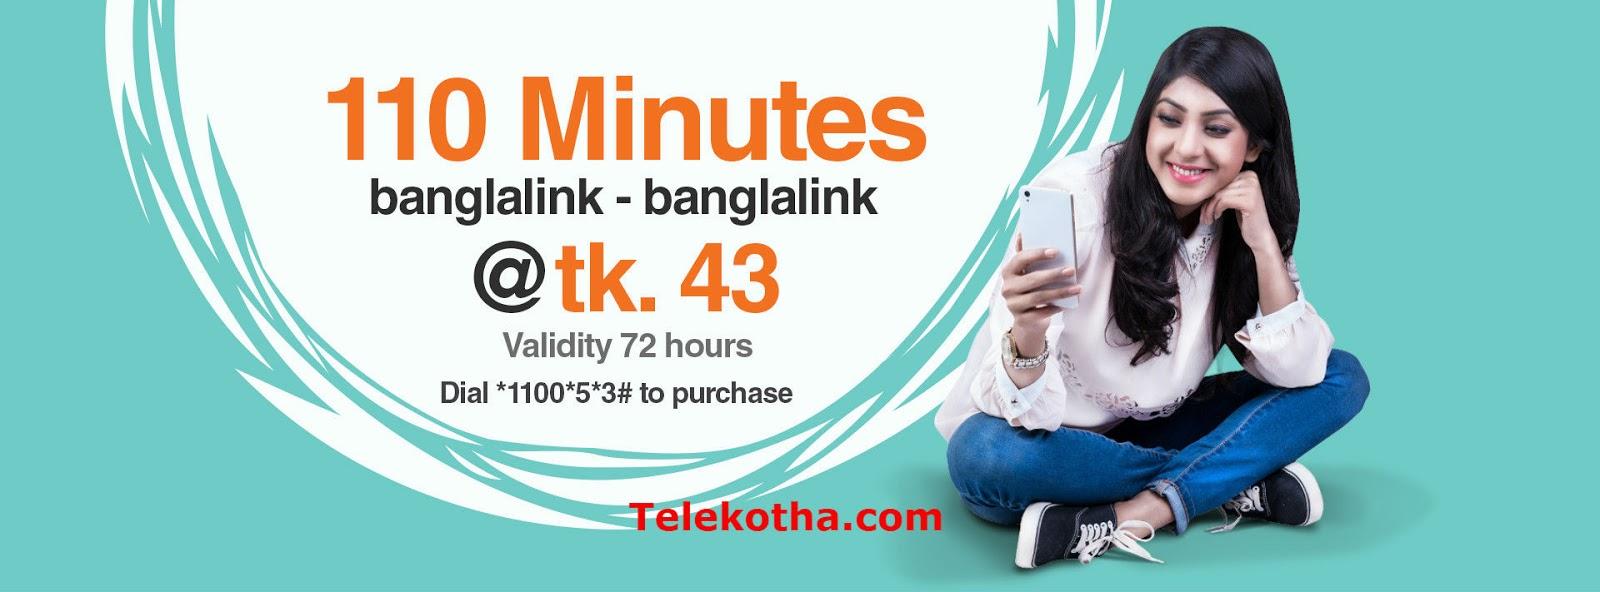 110 minutes (banglalink-banglalink) for just Tk. 43. Dial *1100*5*3#